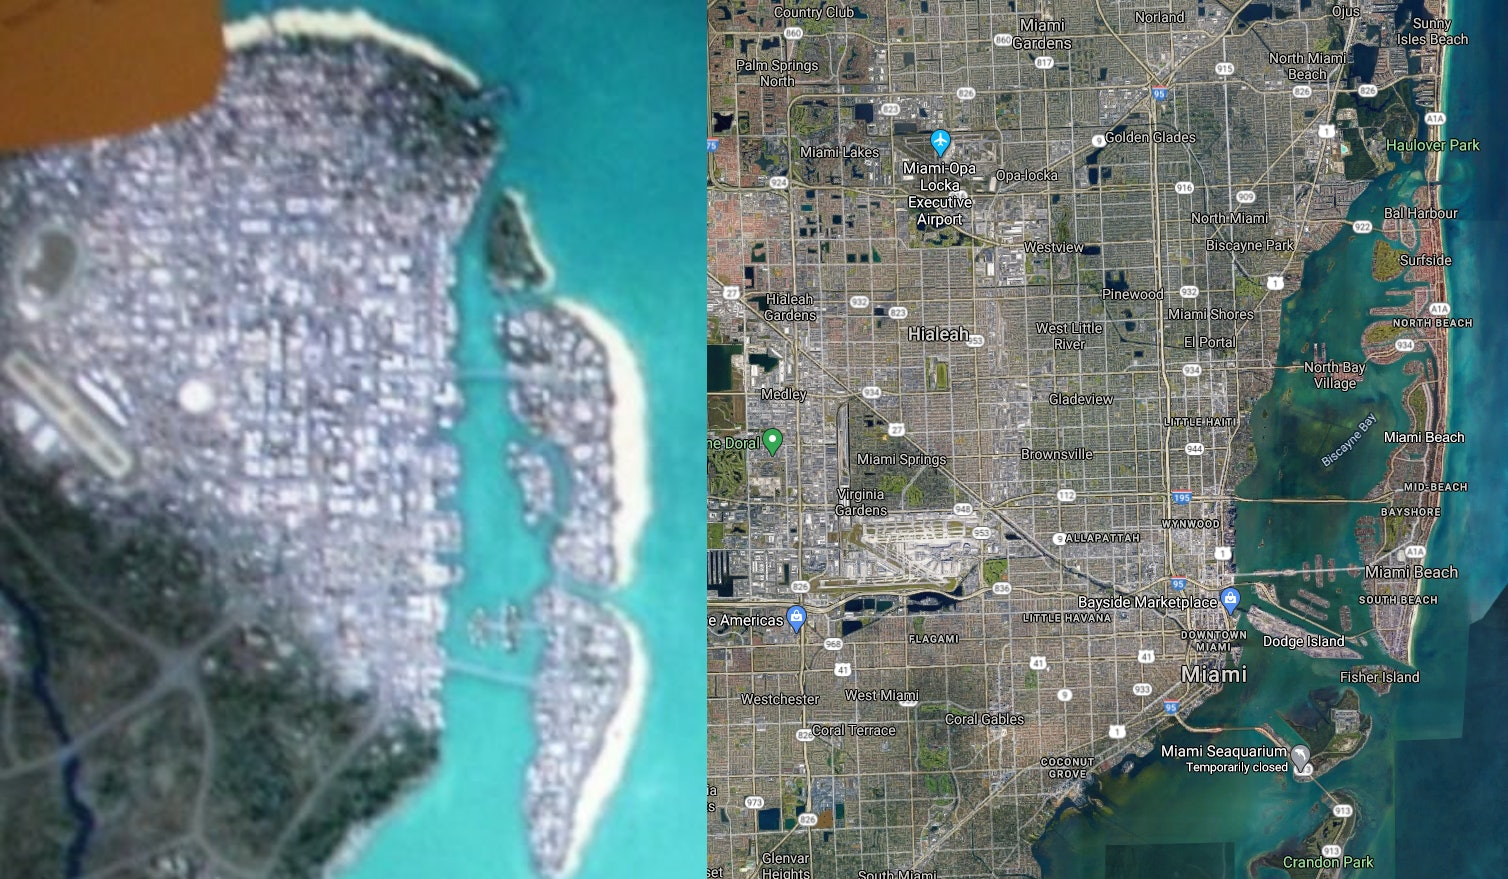 Gta 6 Map Leak Seemingly Confirms Project Americas Rumors